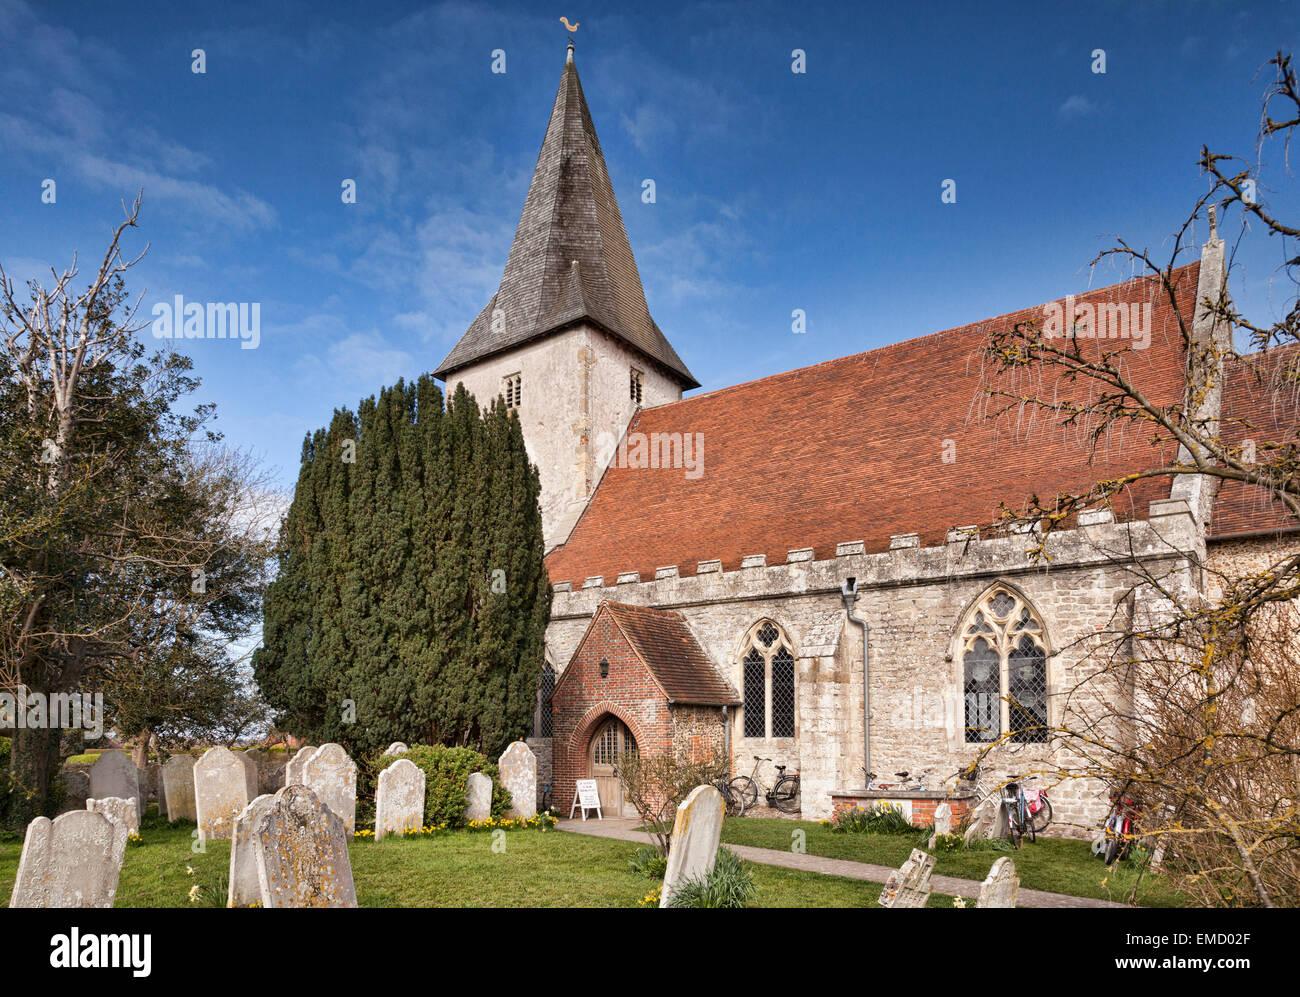 Le 14e siècle l'église Holy Trinity, à Bosham, West Sussex, Angleterre Photo Stock